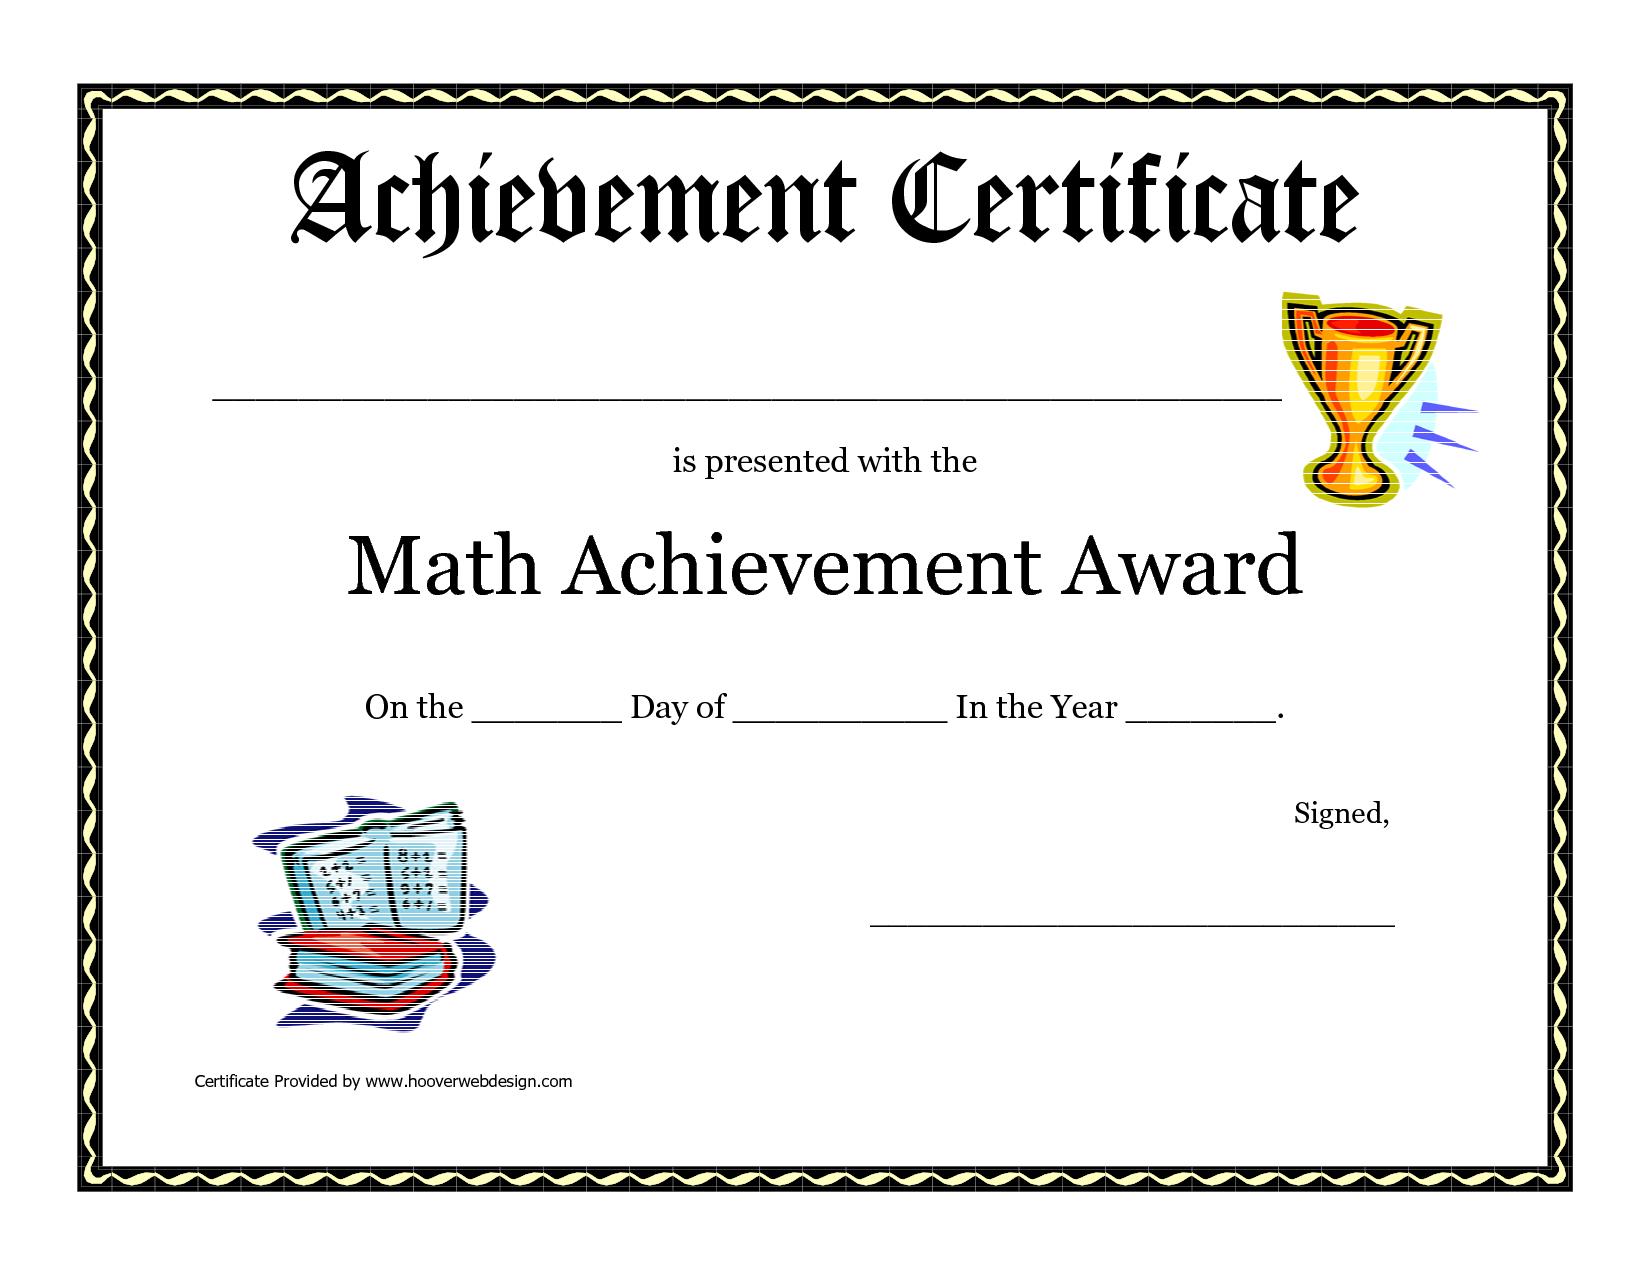 Math Achievement Award Printable Certificate Pdf | Math Activites - Free Printable Piano Recital Certificates